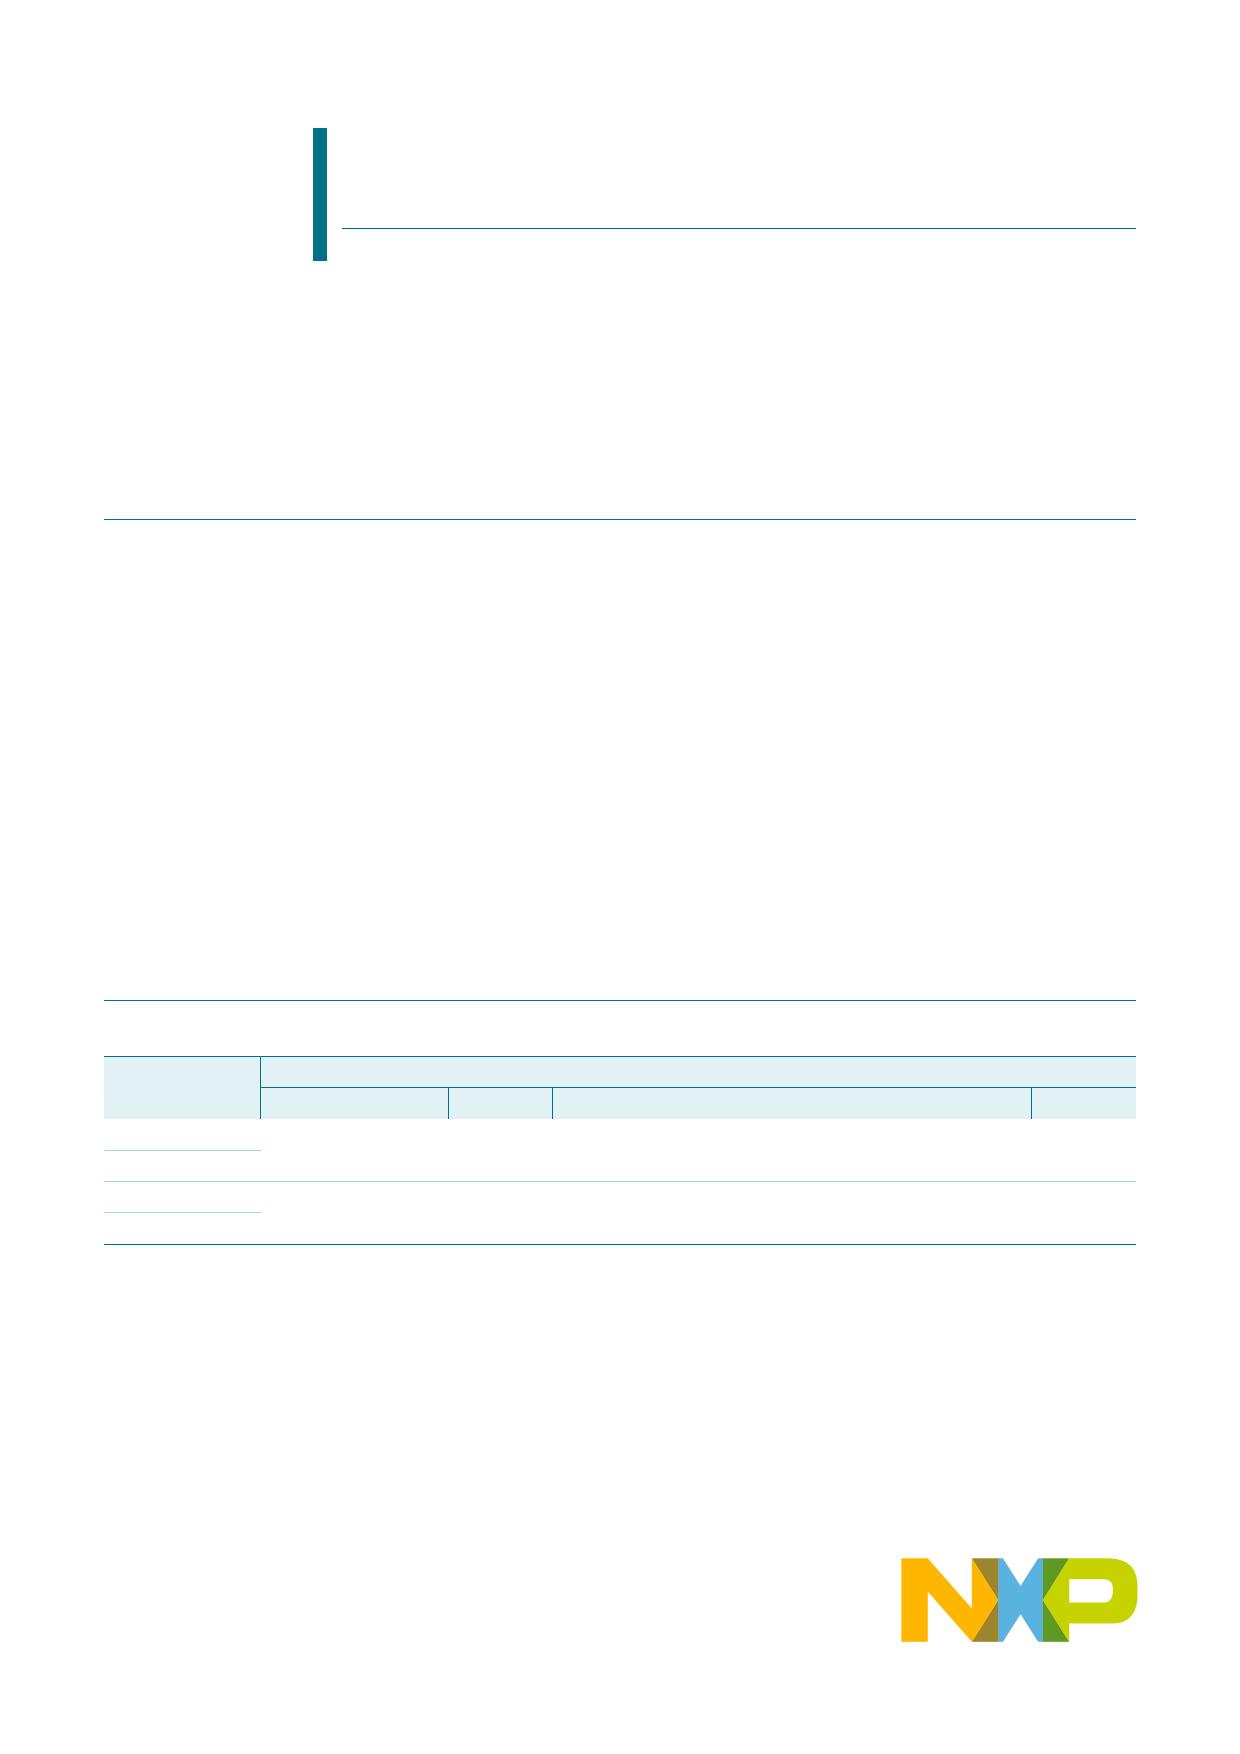 74HC1G04 datasheet